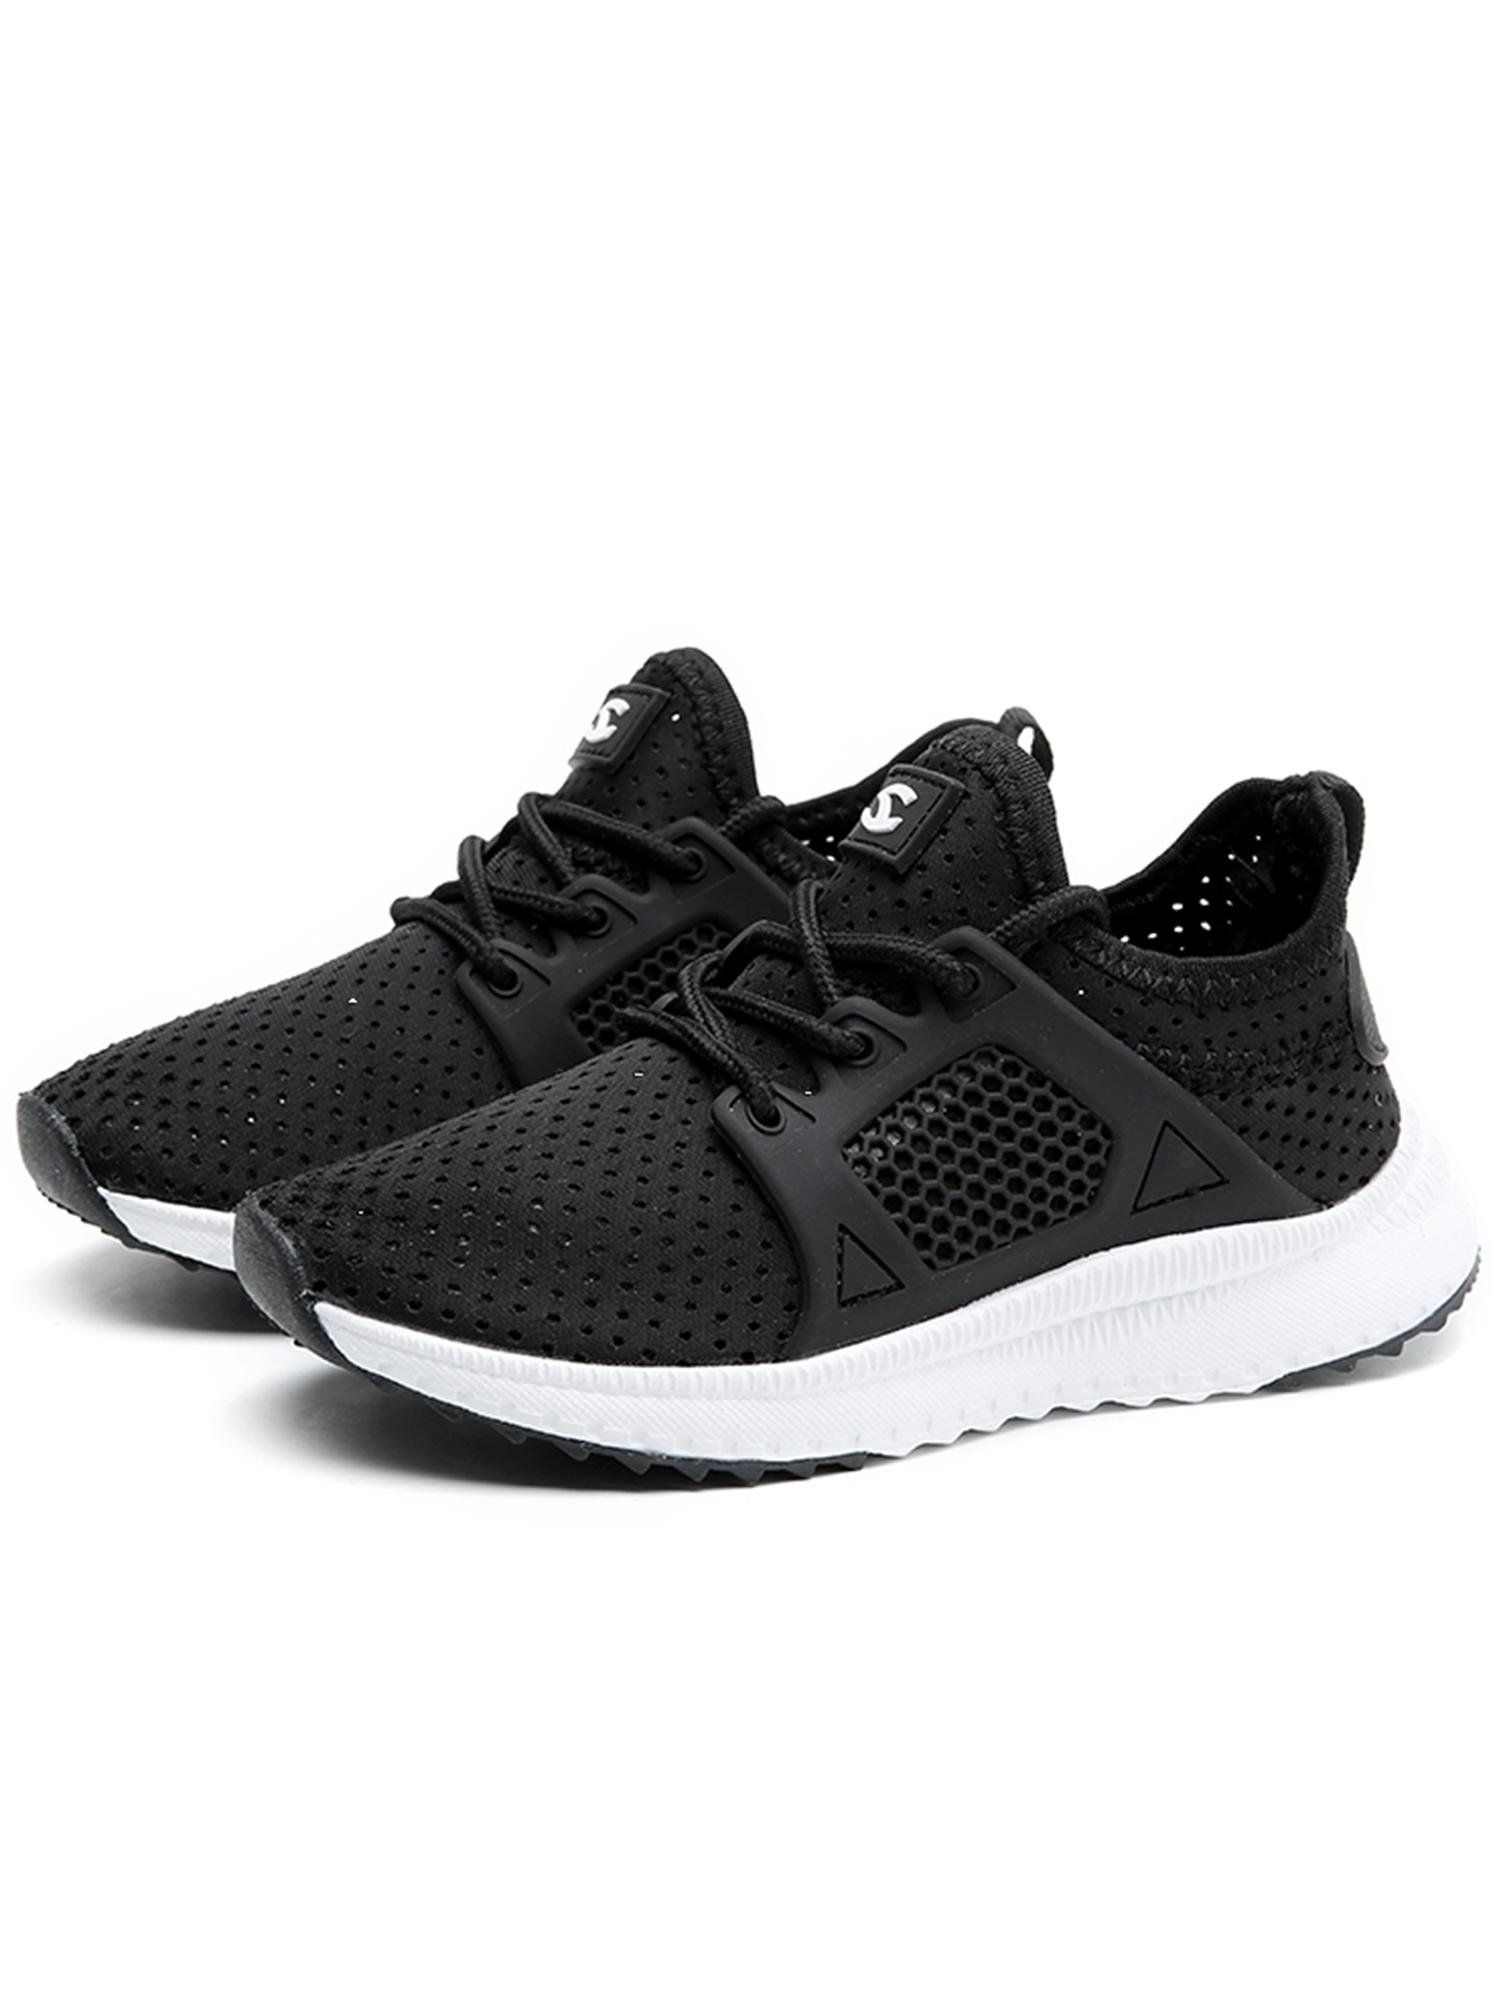 Kids Boys Girls Running Shoes Athletic Comfortable Fashion LightWeight Mesh Slip on Cushion Sneakers